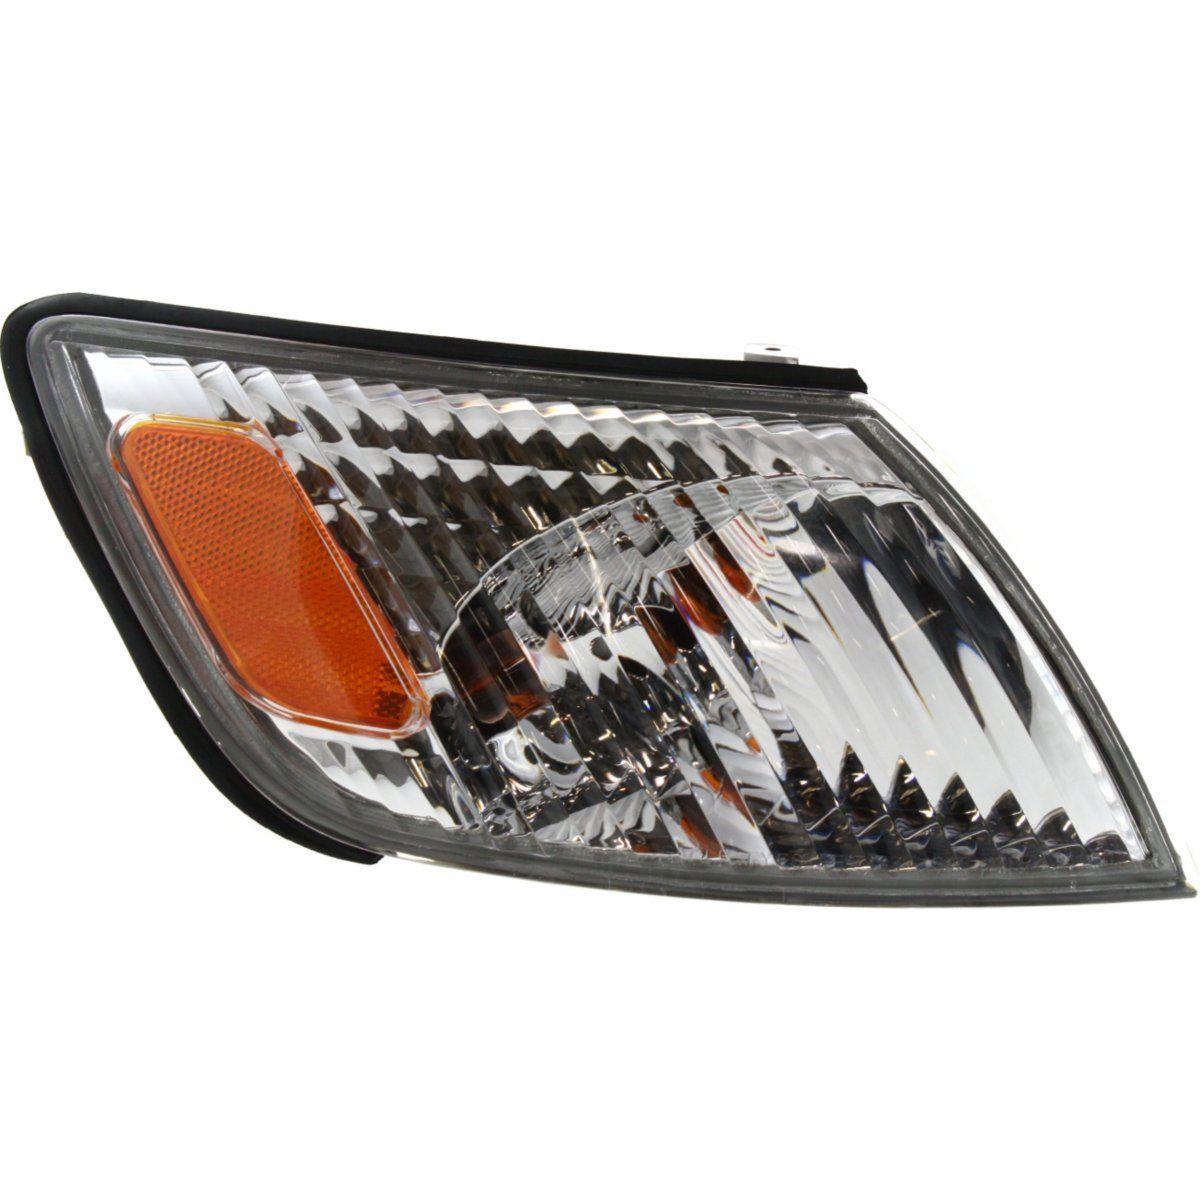 USコーナーライト Corner Light For 2000-2001 Lexus ES300 Passenger Side Incandescent w/ Bulb コーナーライト2000-2001用レクサスES300乗用車用白熱電球